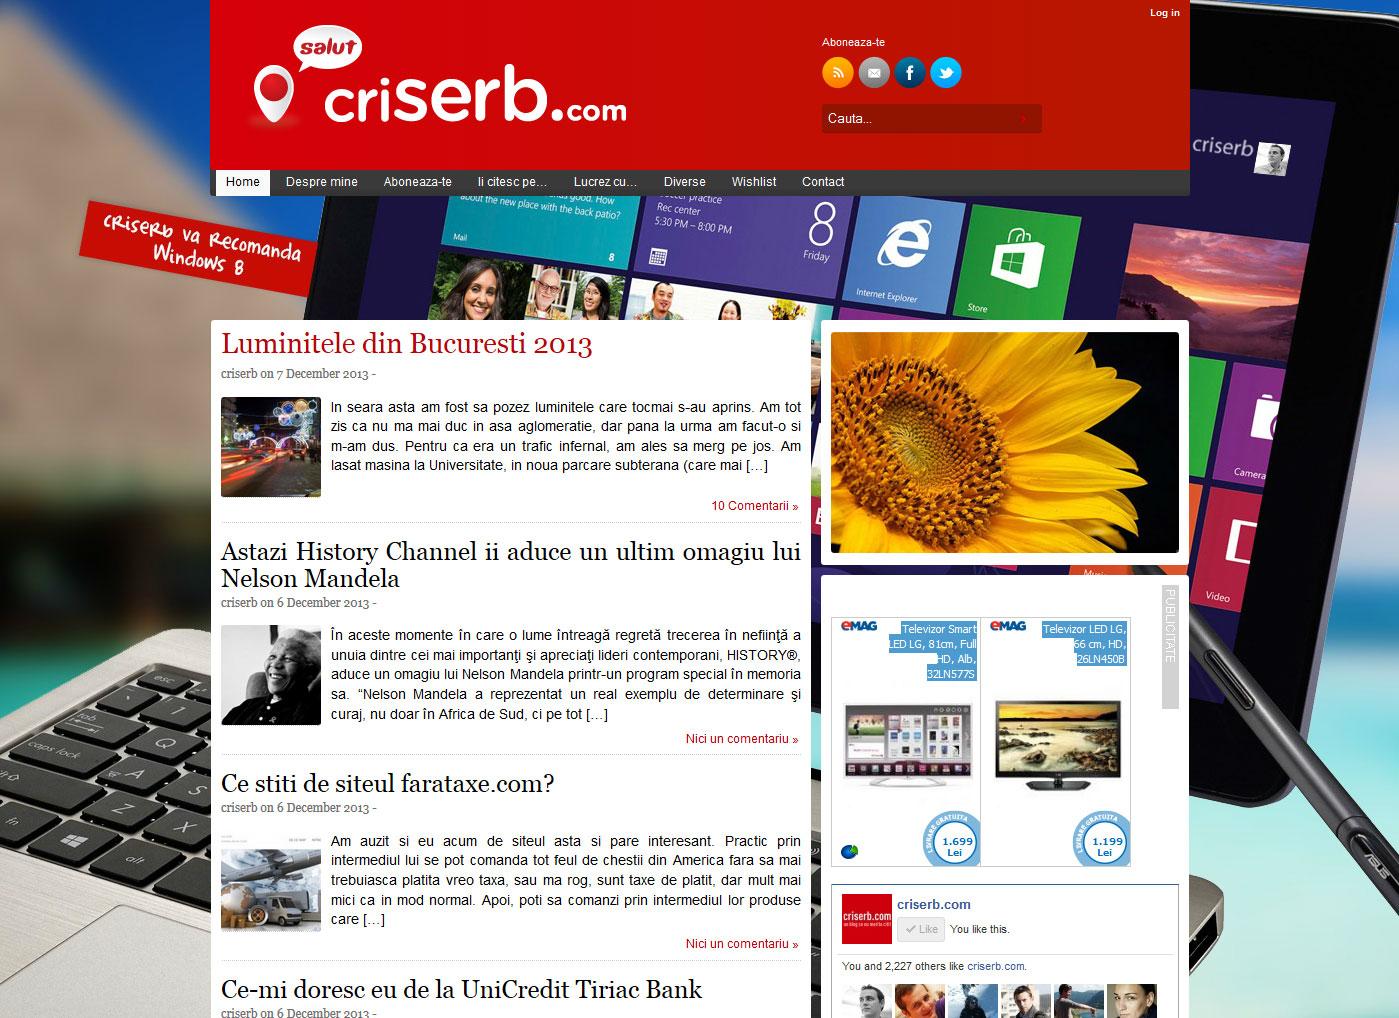 criserb_old